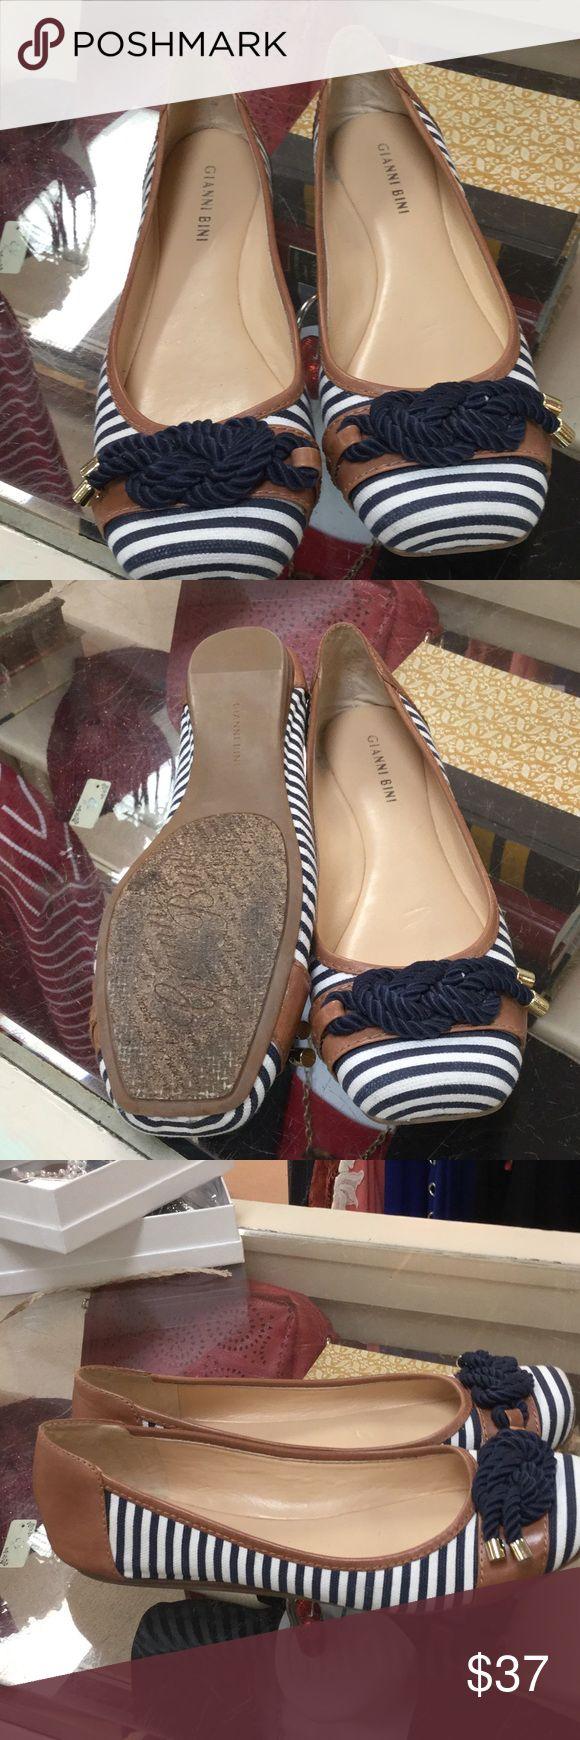 Gianni Bini Flats Nautical Gianni Bini Flats Gianni Bini Shoes Flats & Loafers